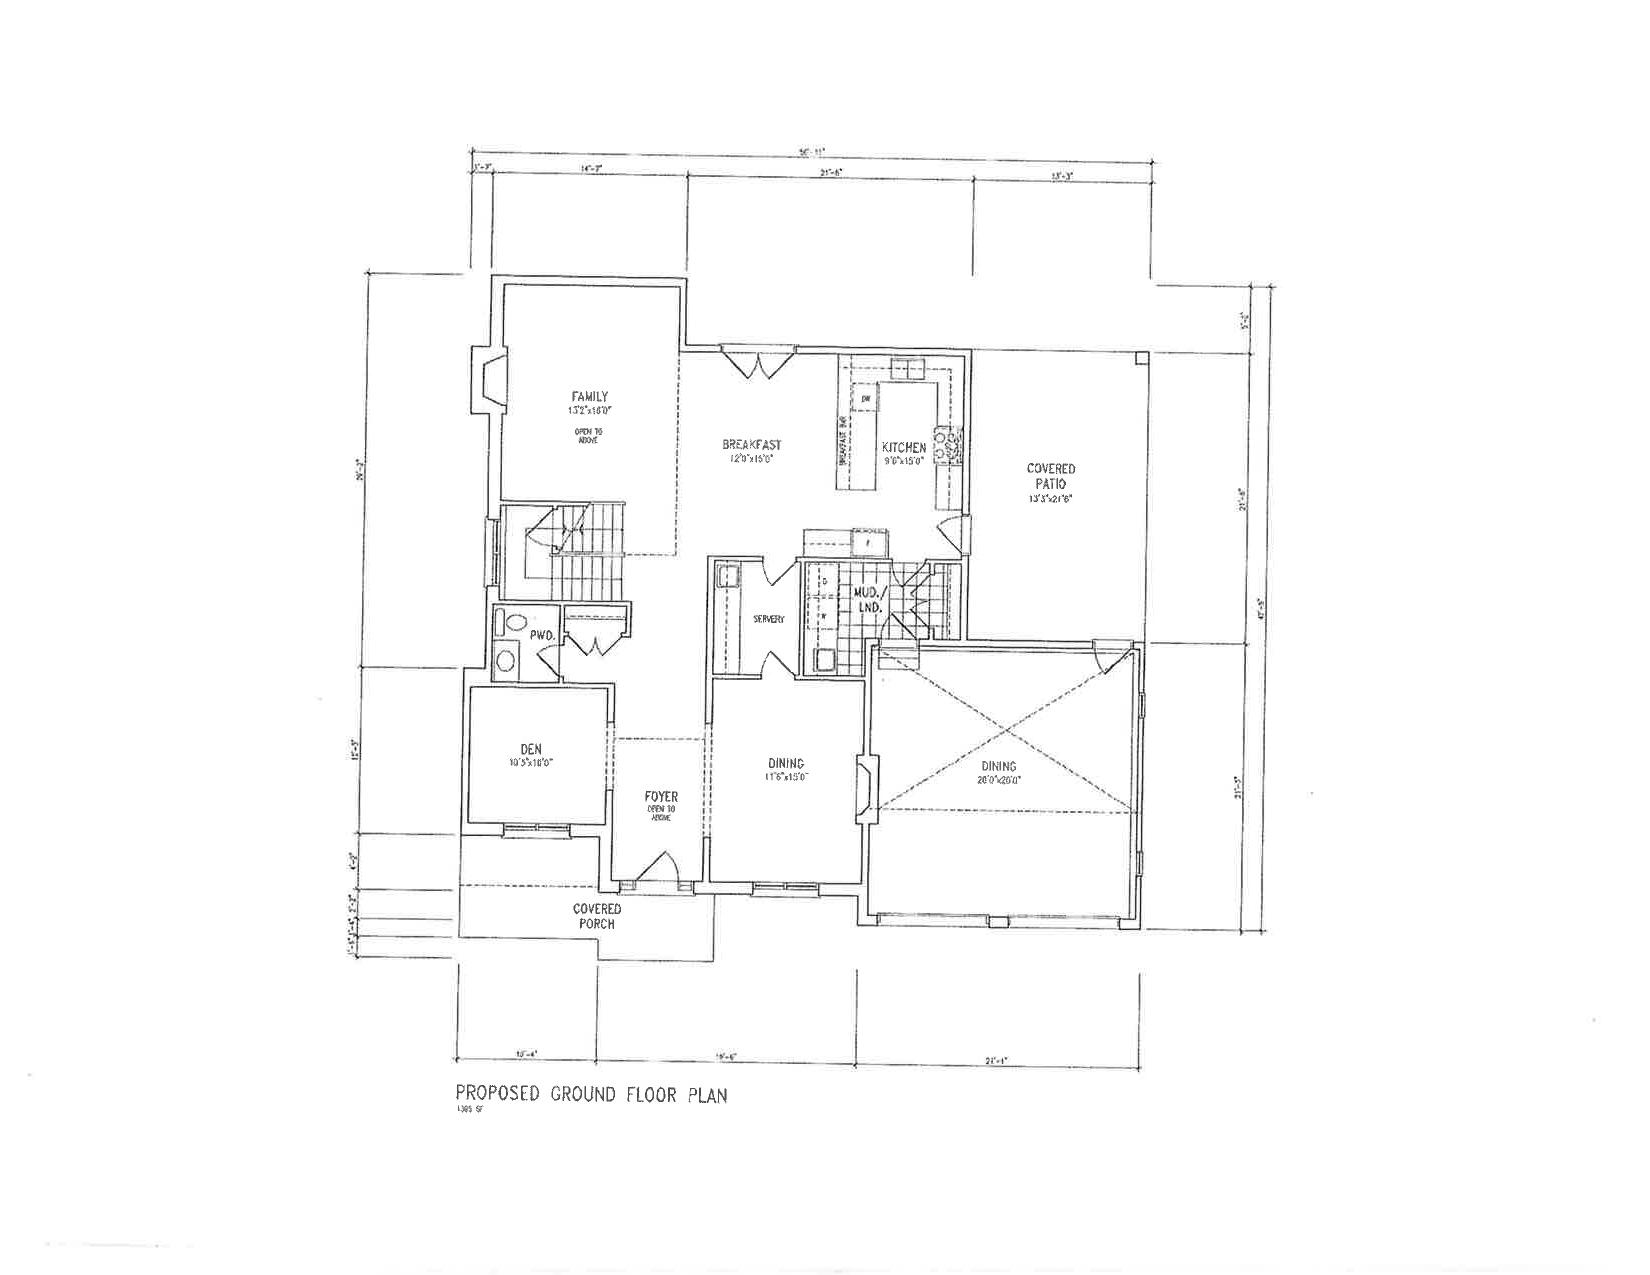 3 Proposed Ground Floor Plan